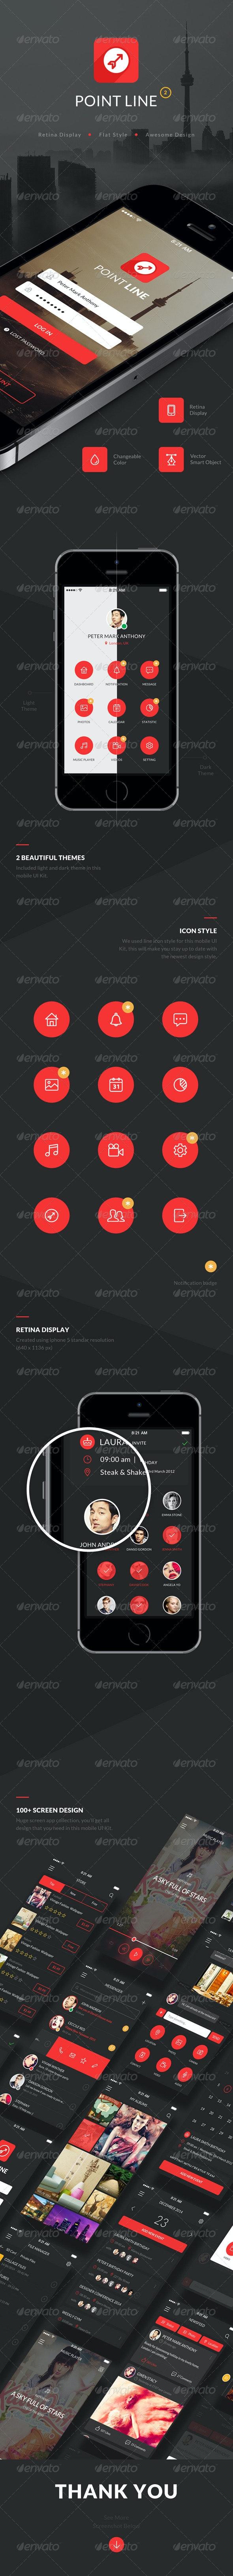 Point Flat Mobile App UI Kit - User Interfaces Web Elements